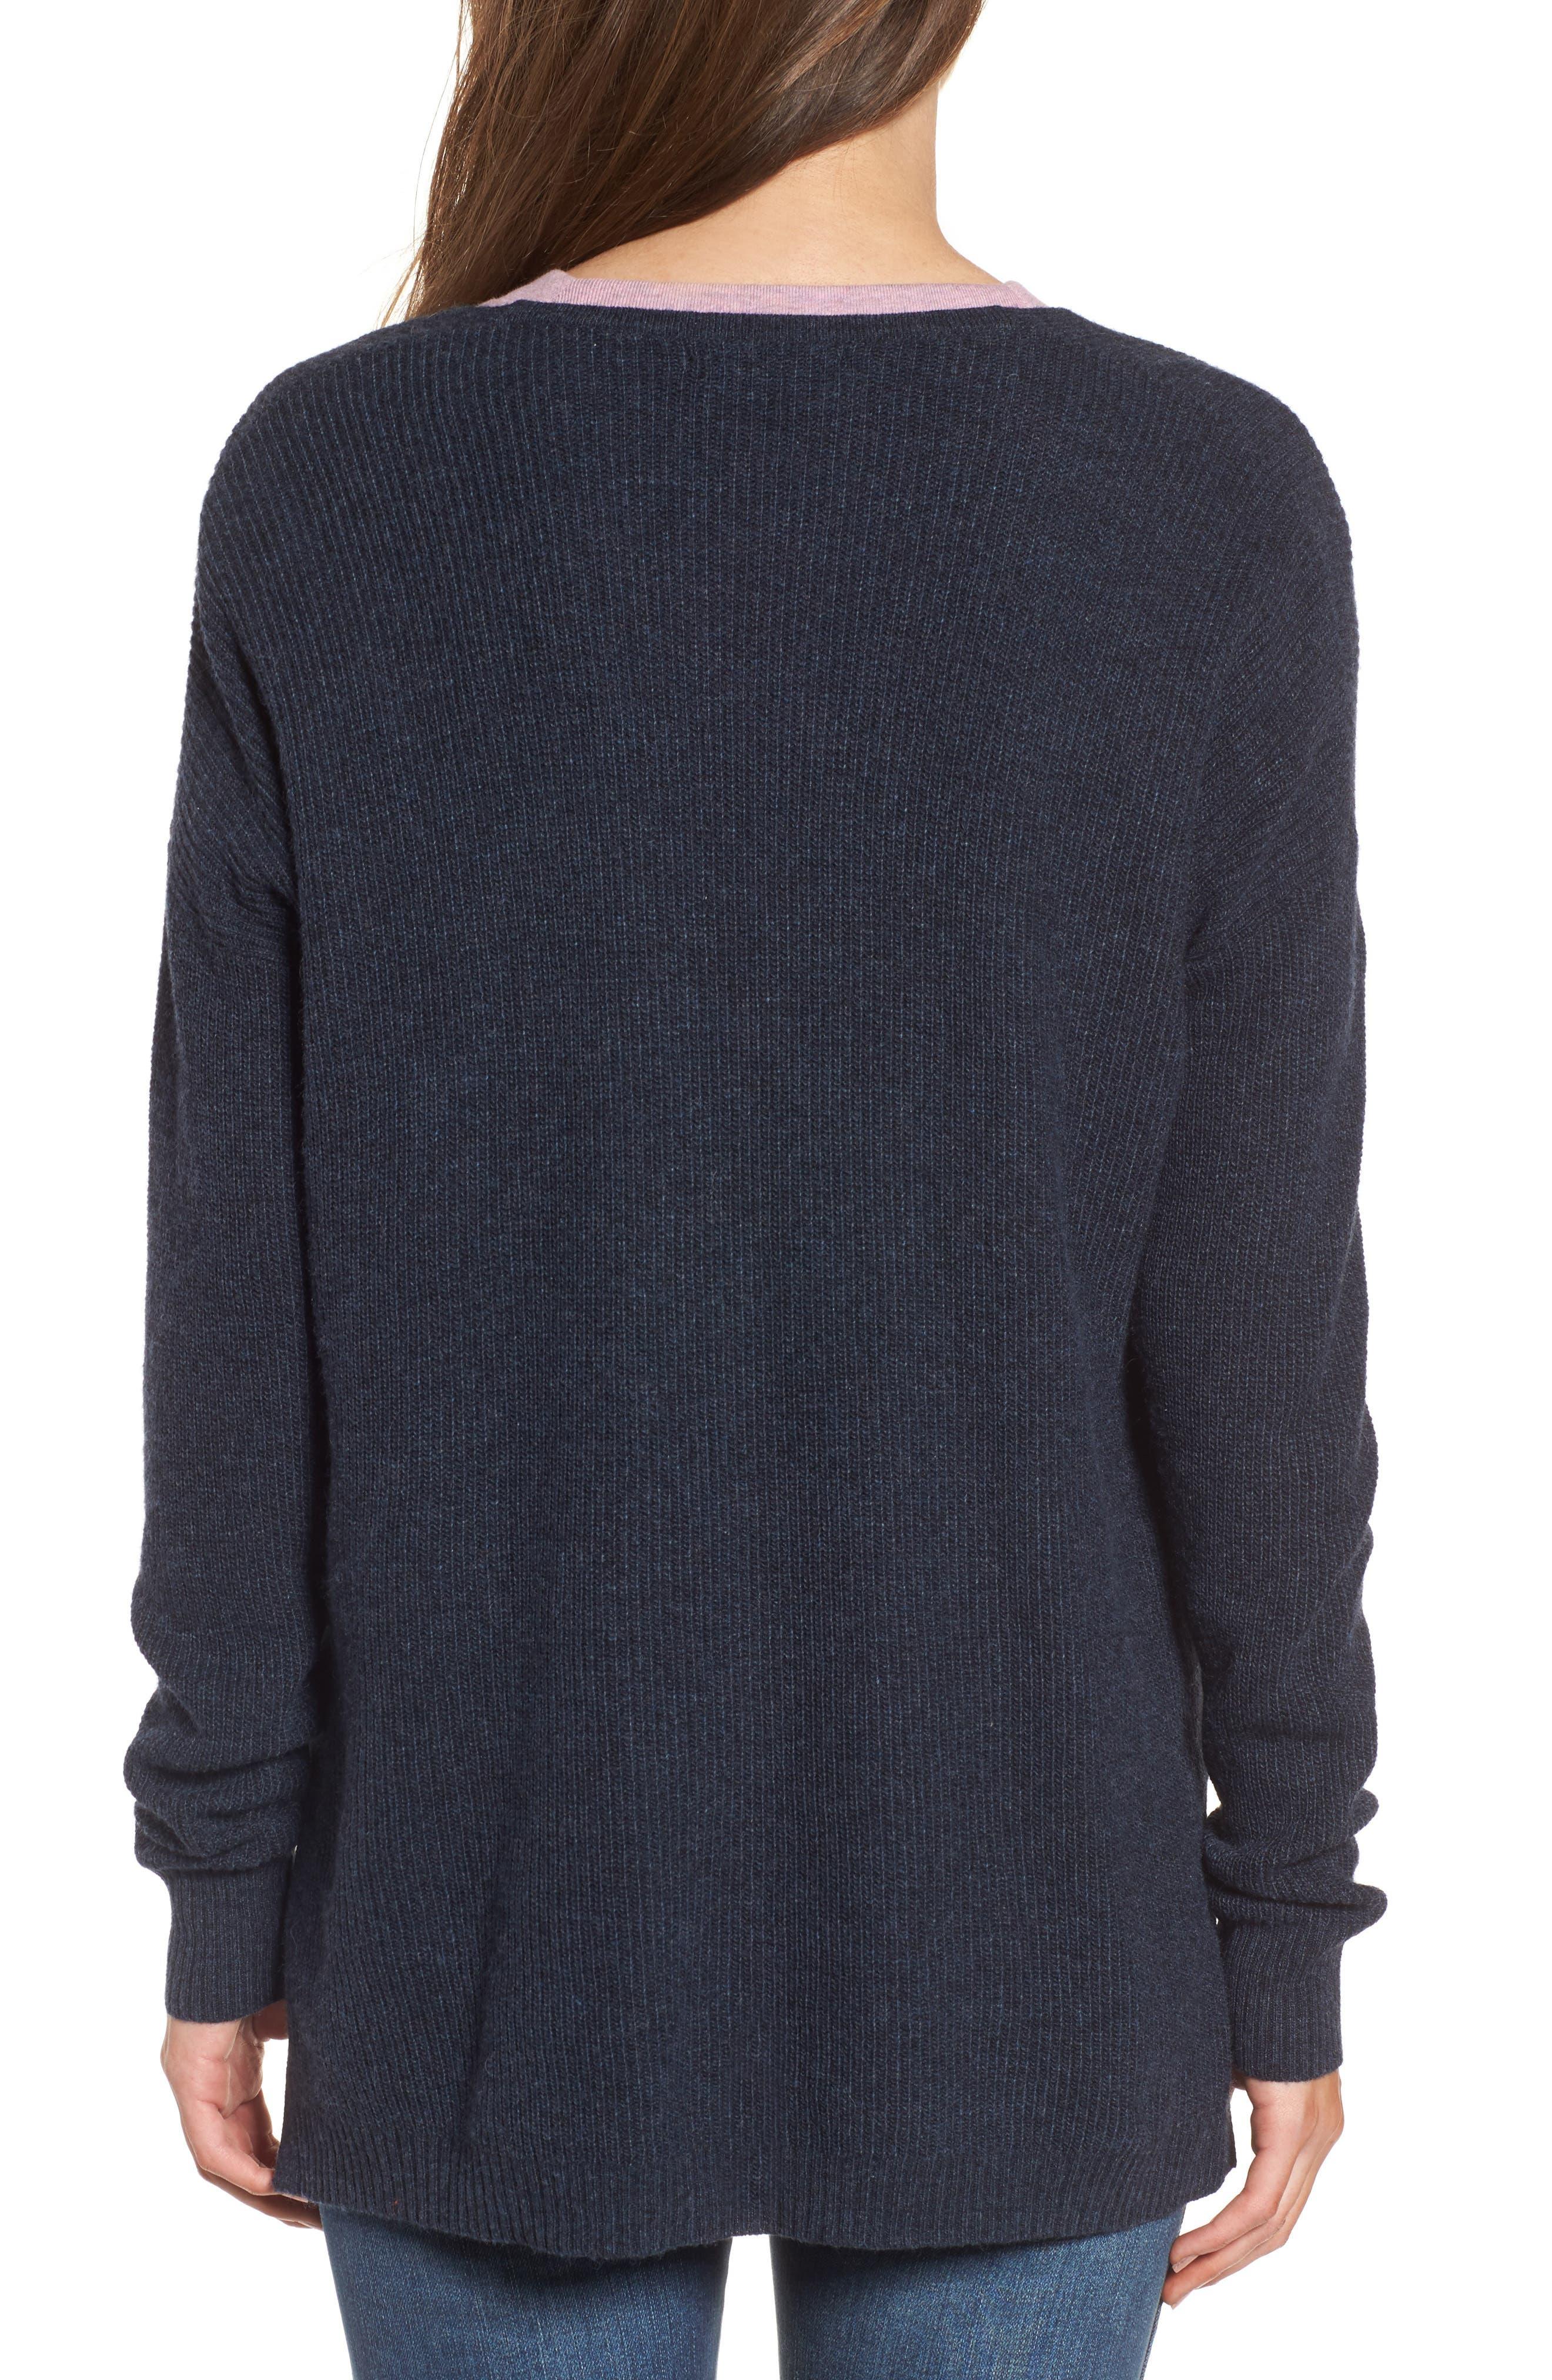 Warmlight V-Neck Sweater,                             Alternate thumbnail 2, color,                             400